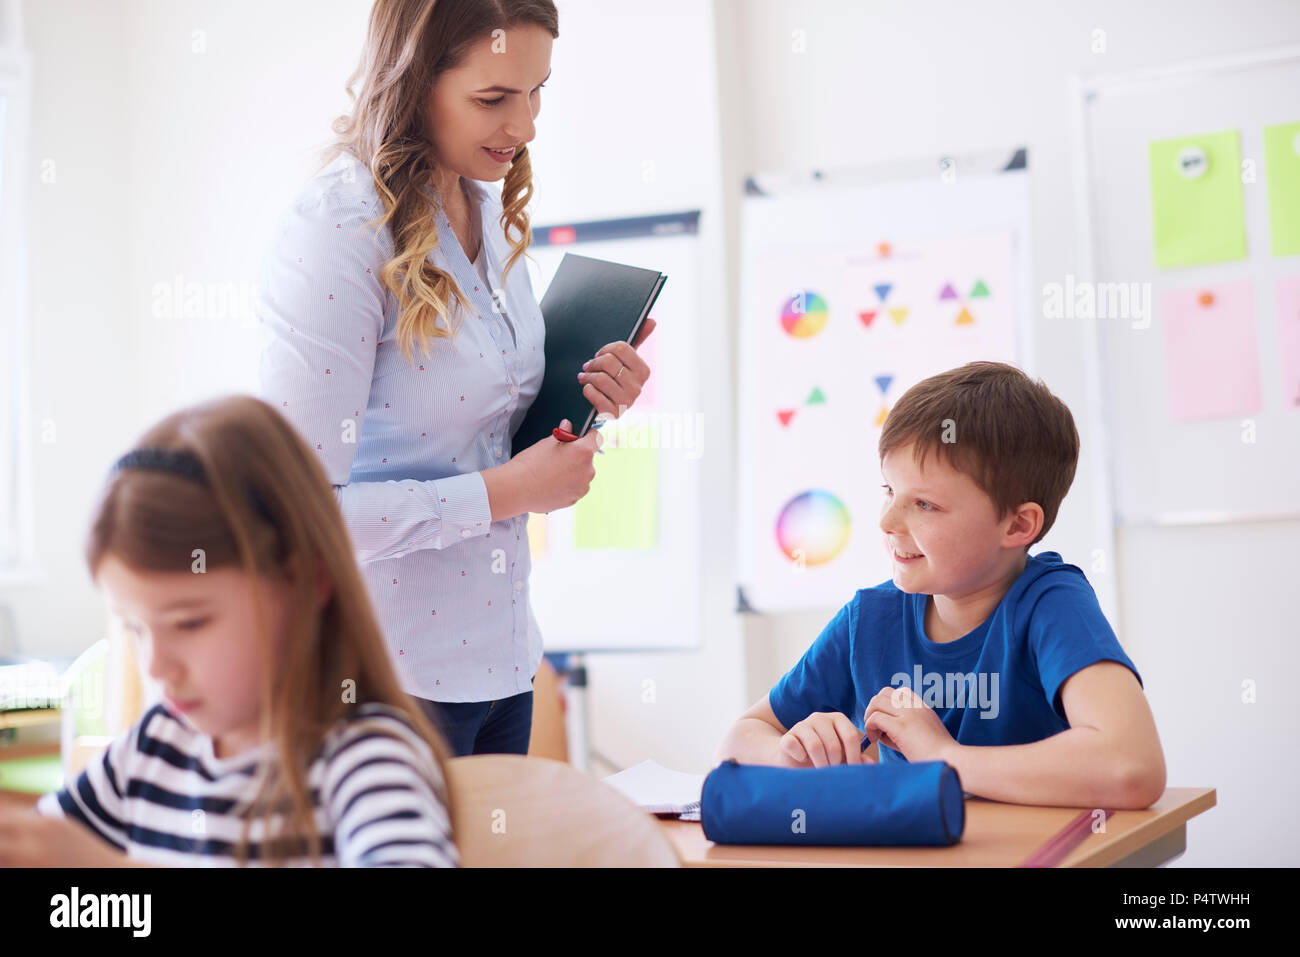 Lehrer lächelnd an Schüler in der Klasse Stockbild